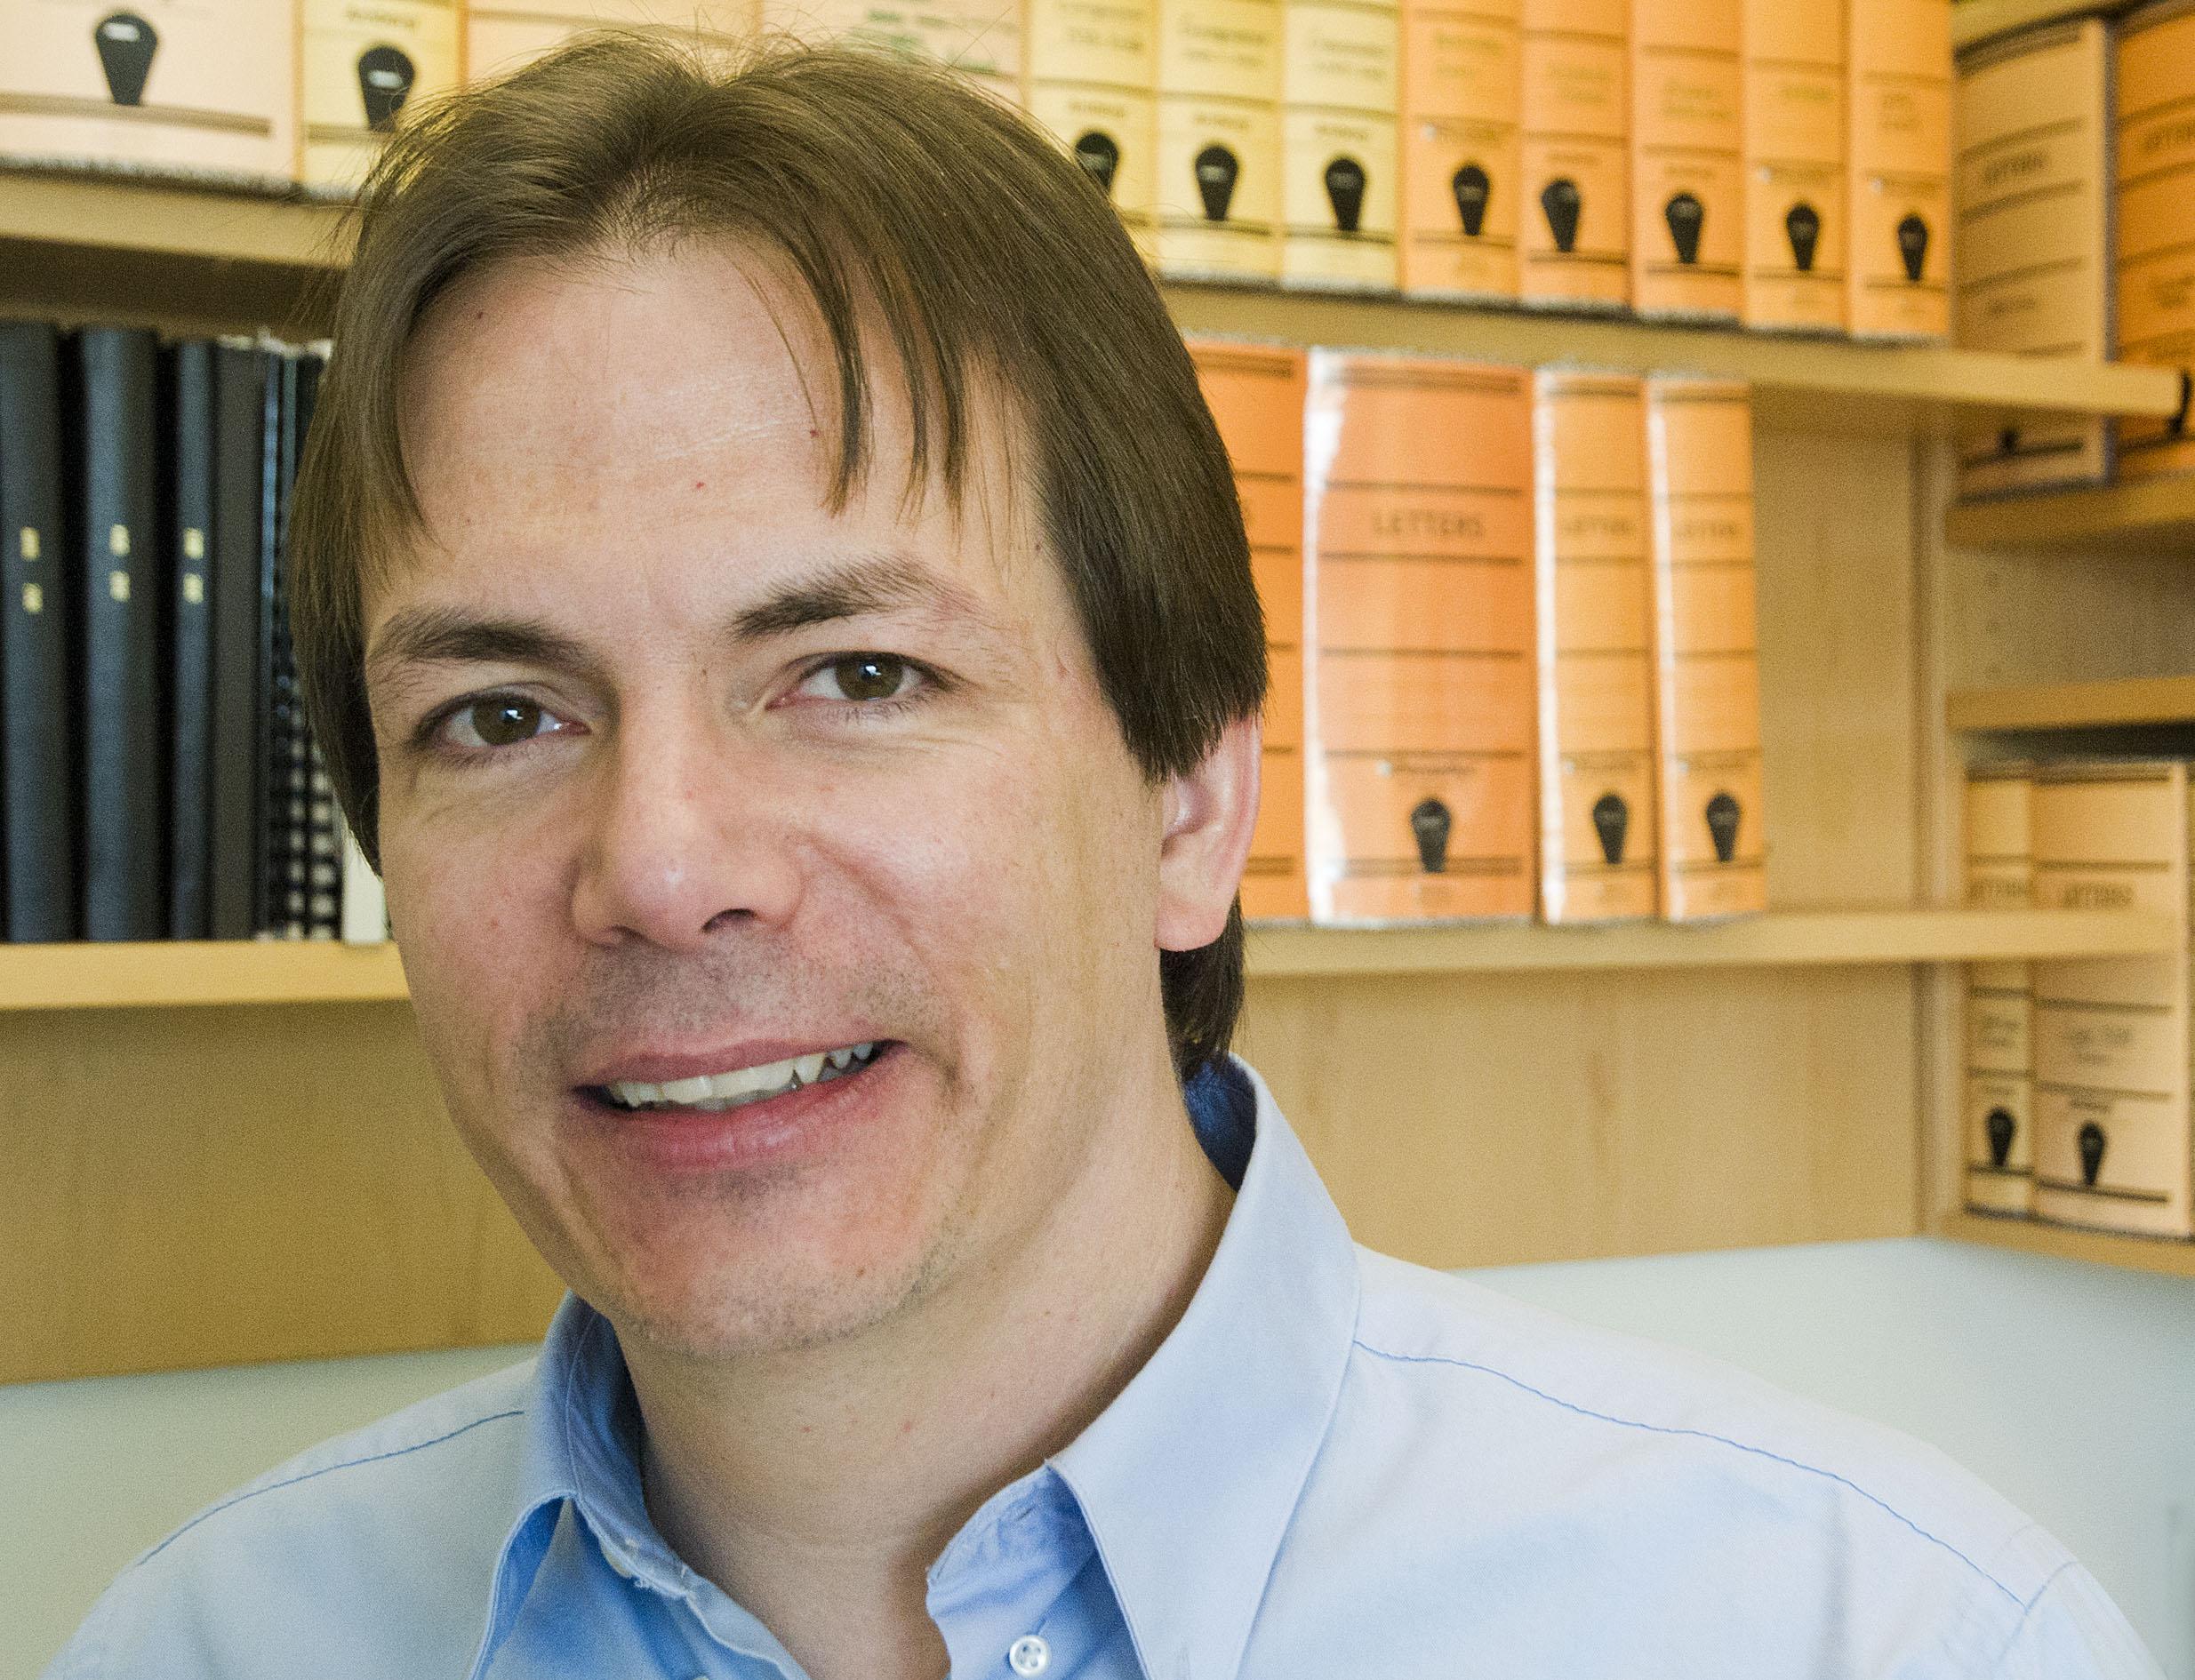 Dr. Evan Eichler